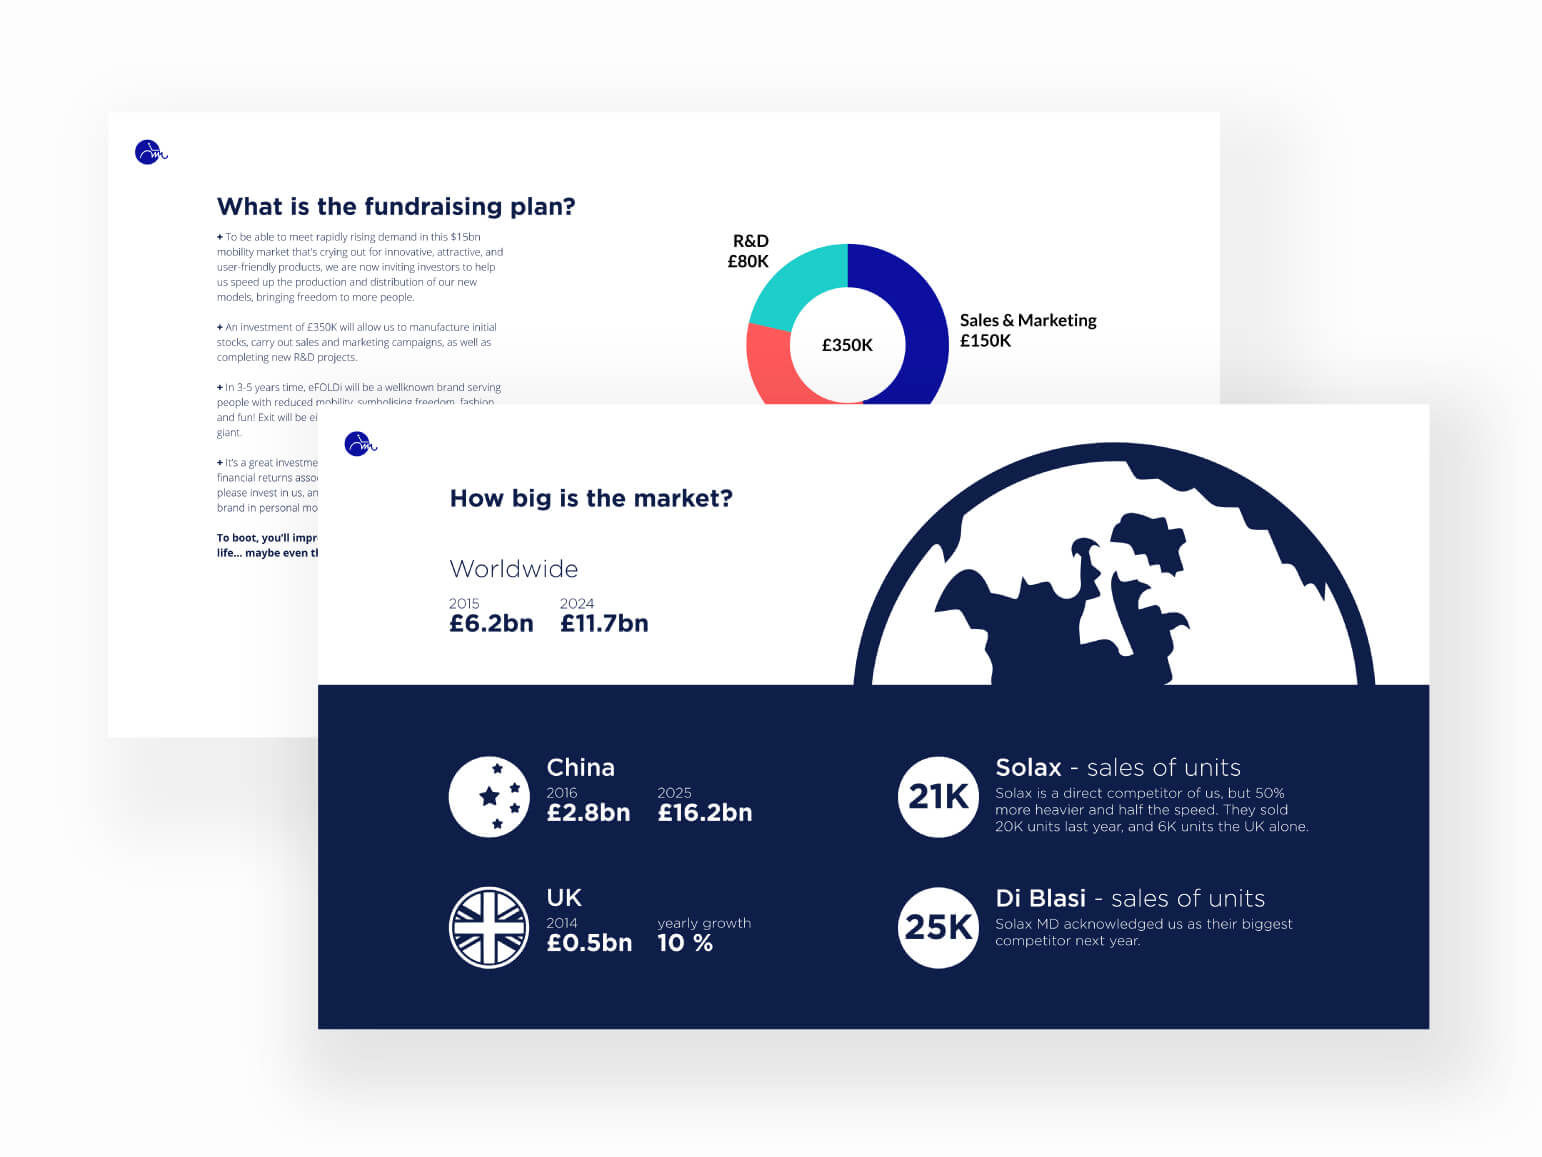 Serkan_Ferah_Branding_Pitching_Design_London_eFoldi-rebranding-crowdfunding-marketing-pitching-pitch-design-02.jpg